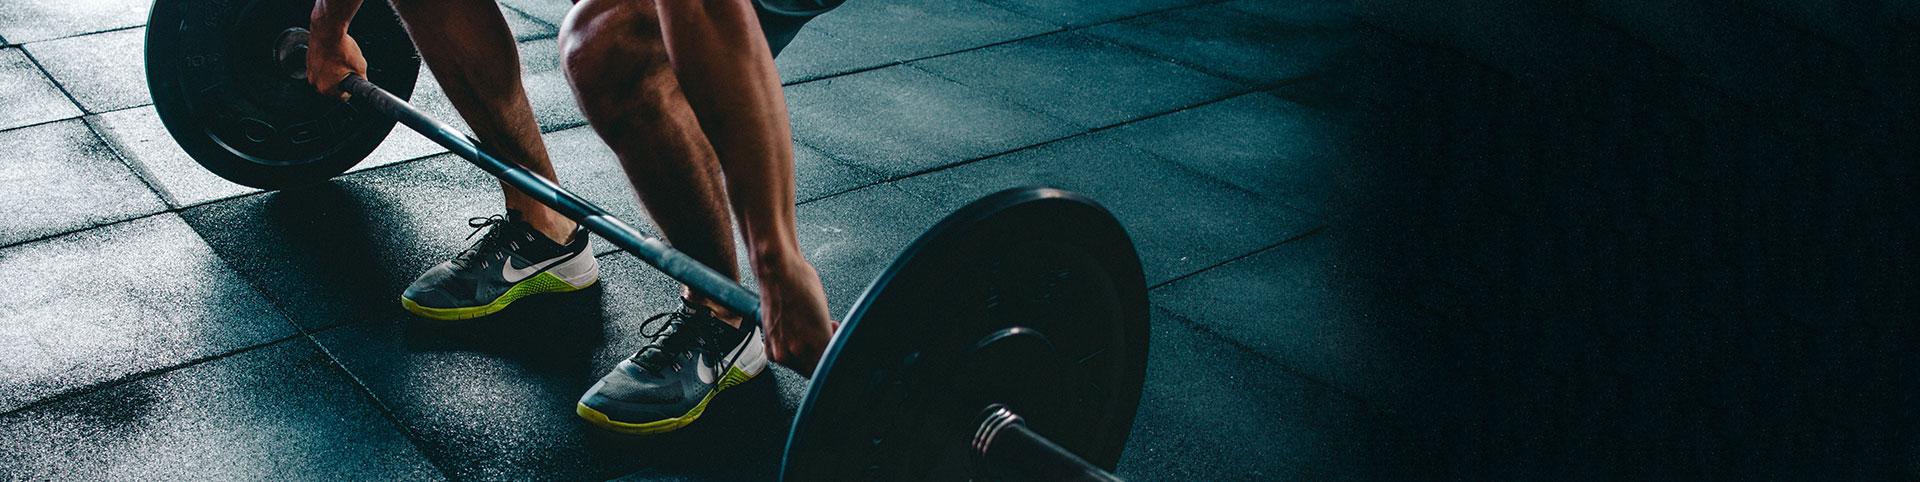 Champions Fitness